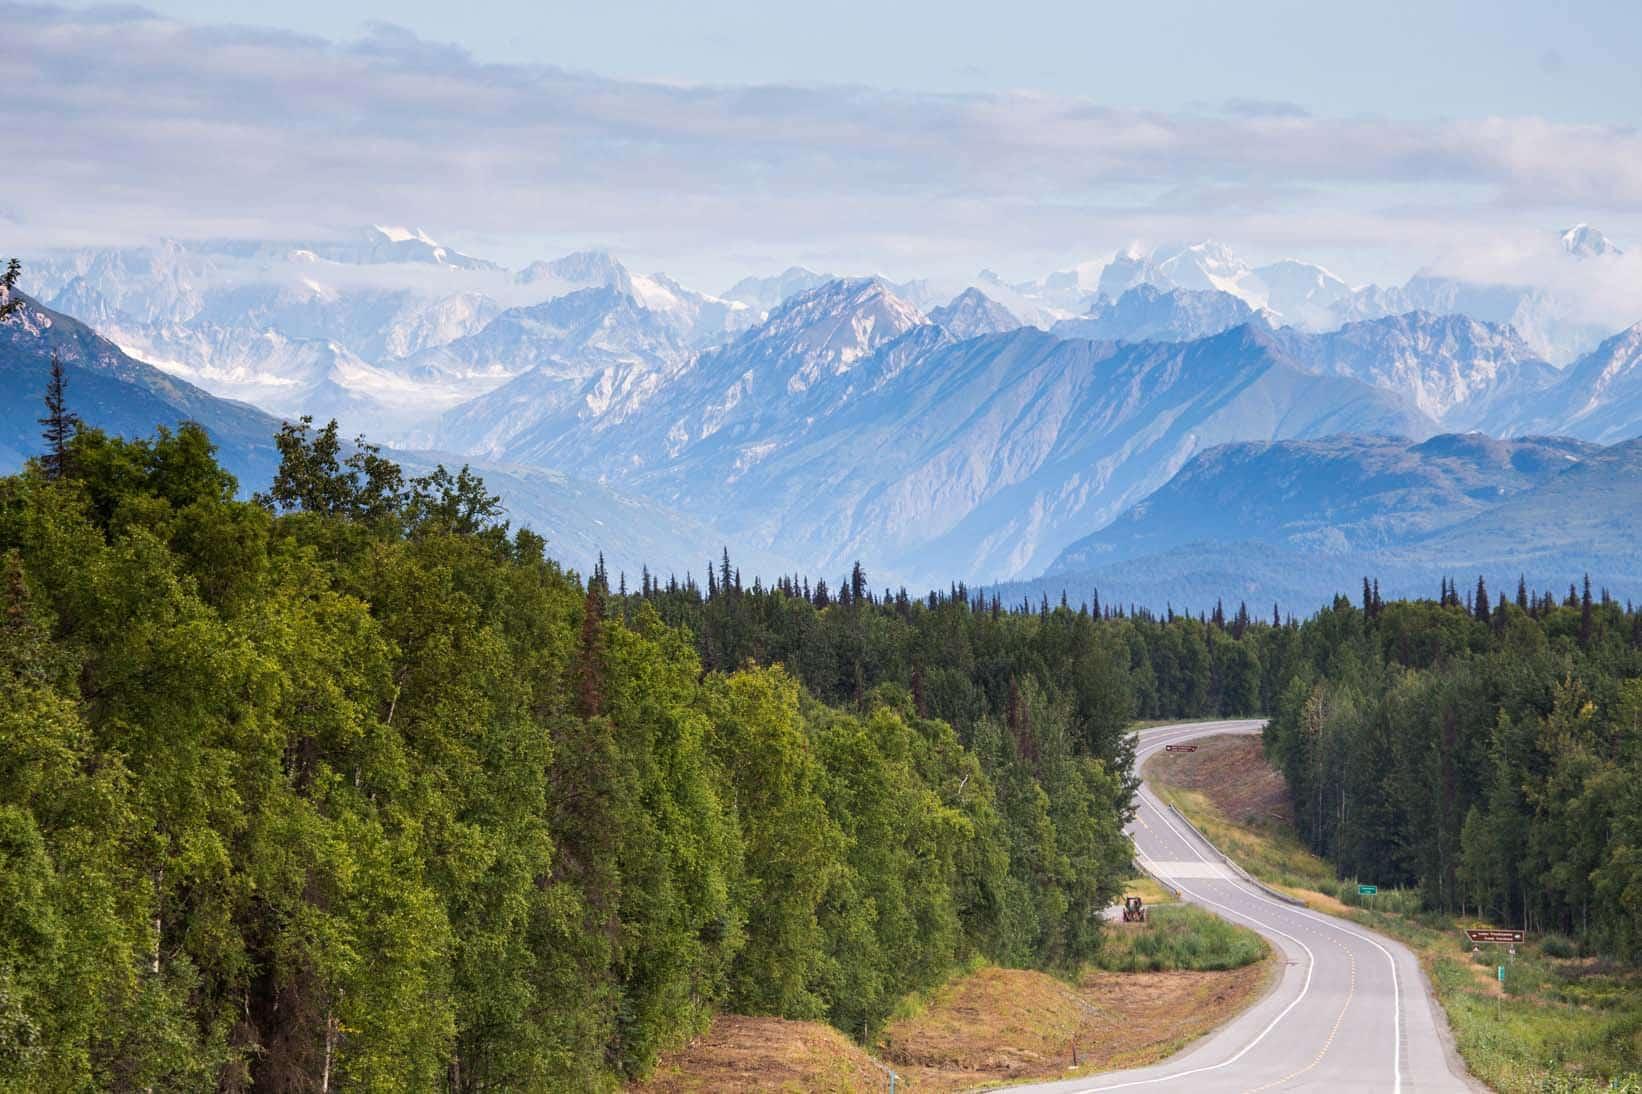 Alaska Day 5: Talkeetna to Denali National Park